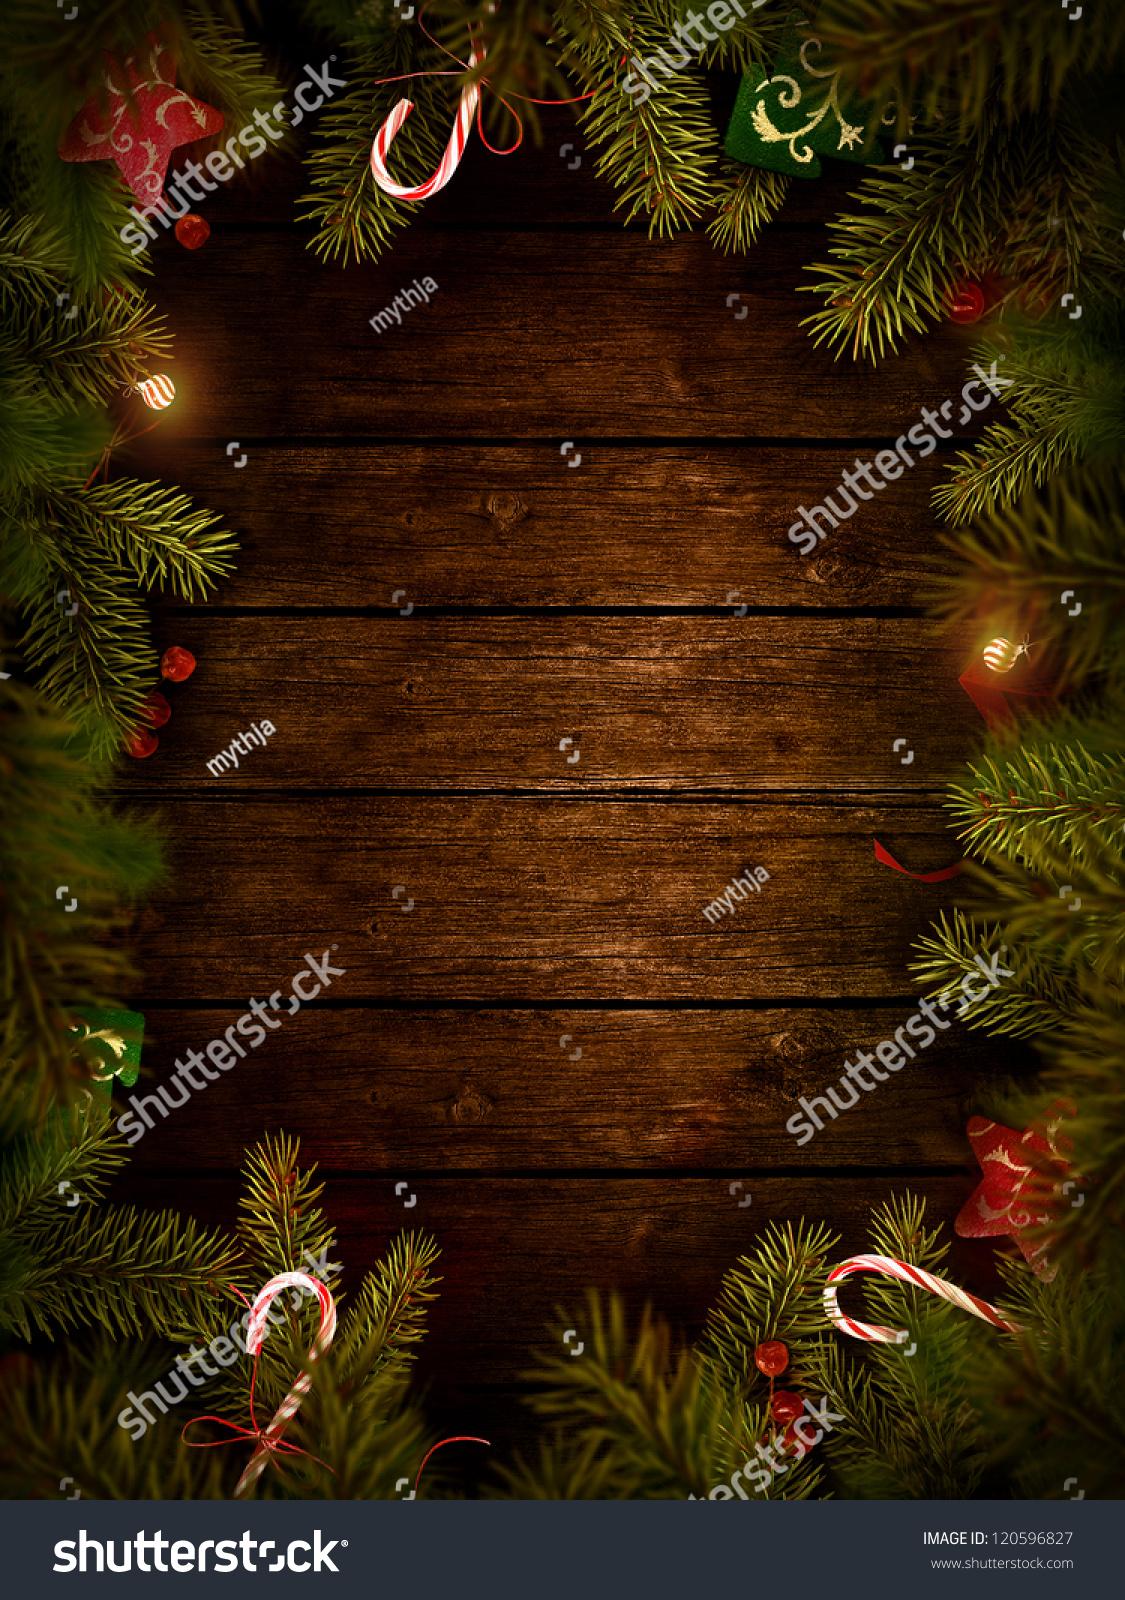 christmas design - merry christmas. xmas wreath card with with